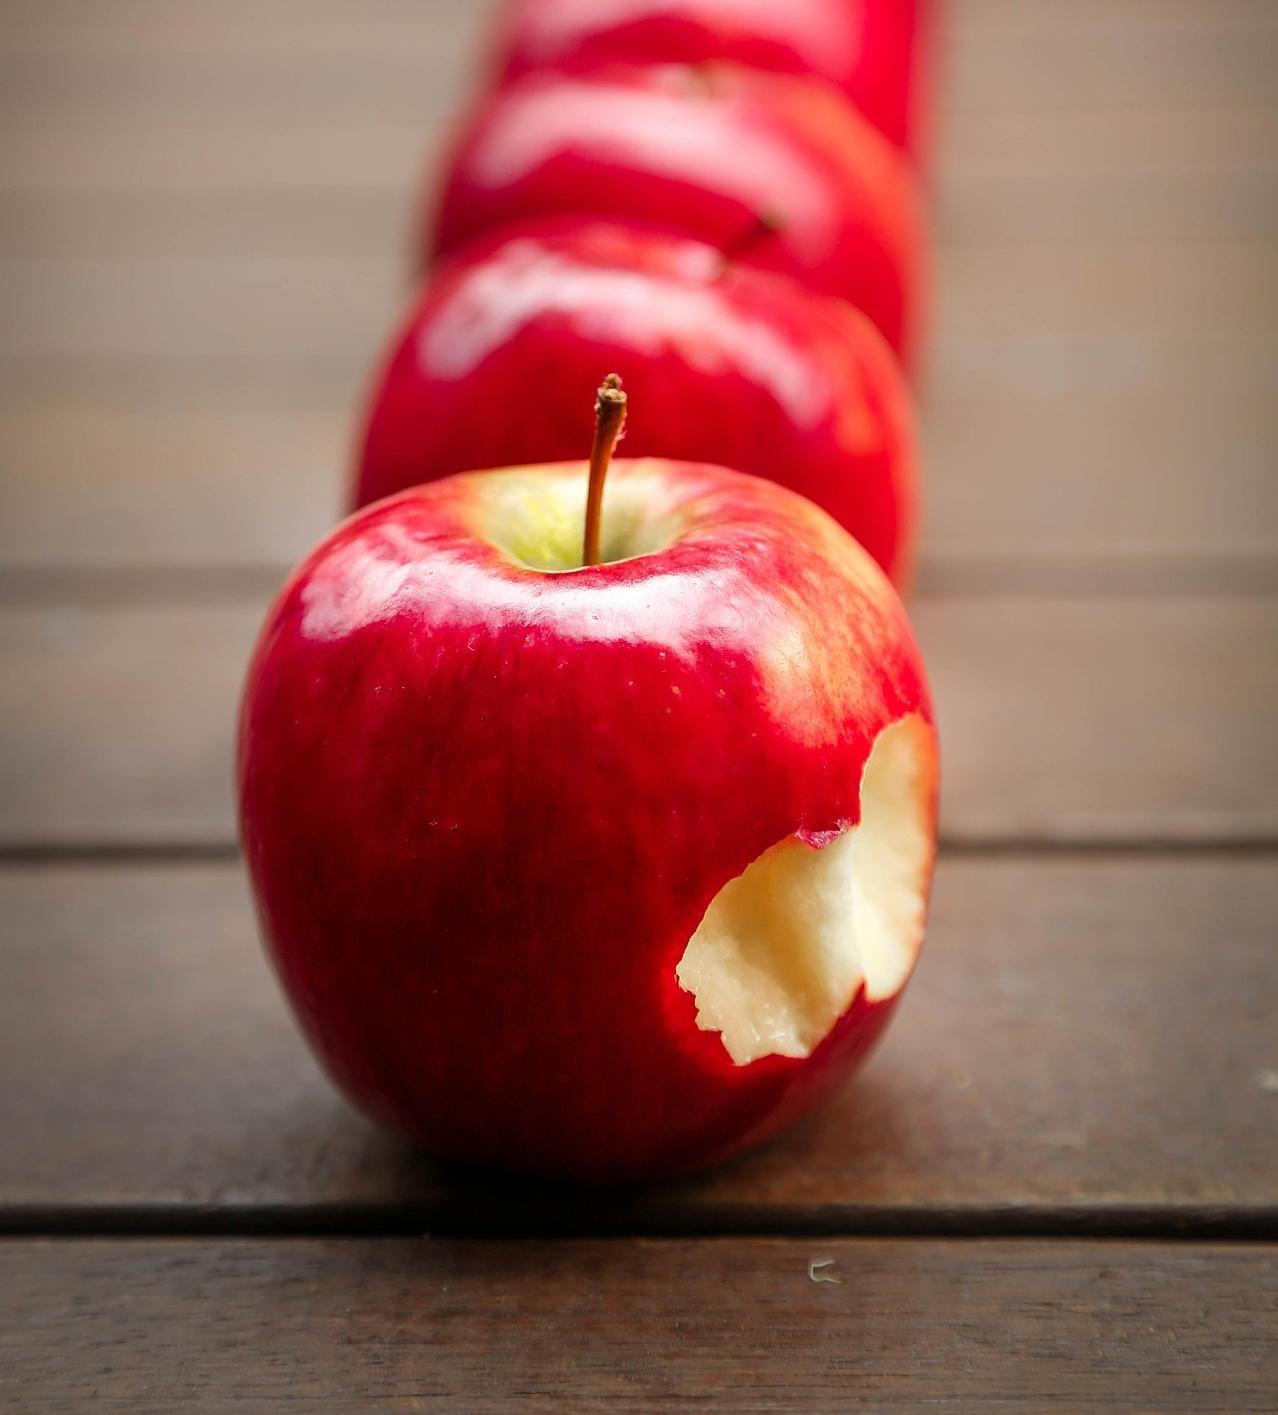 Golden Bay Fruit Apples Marketing